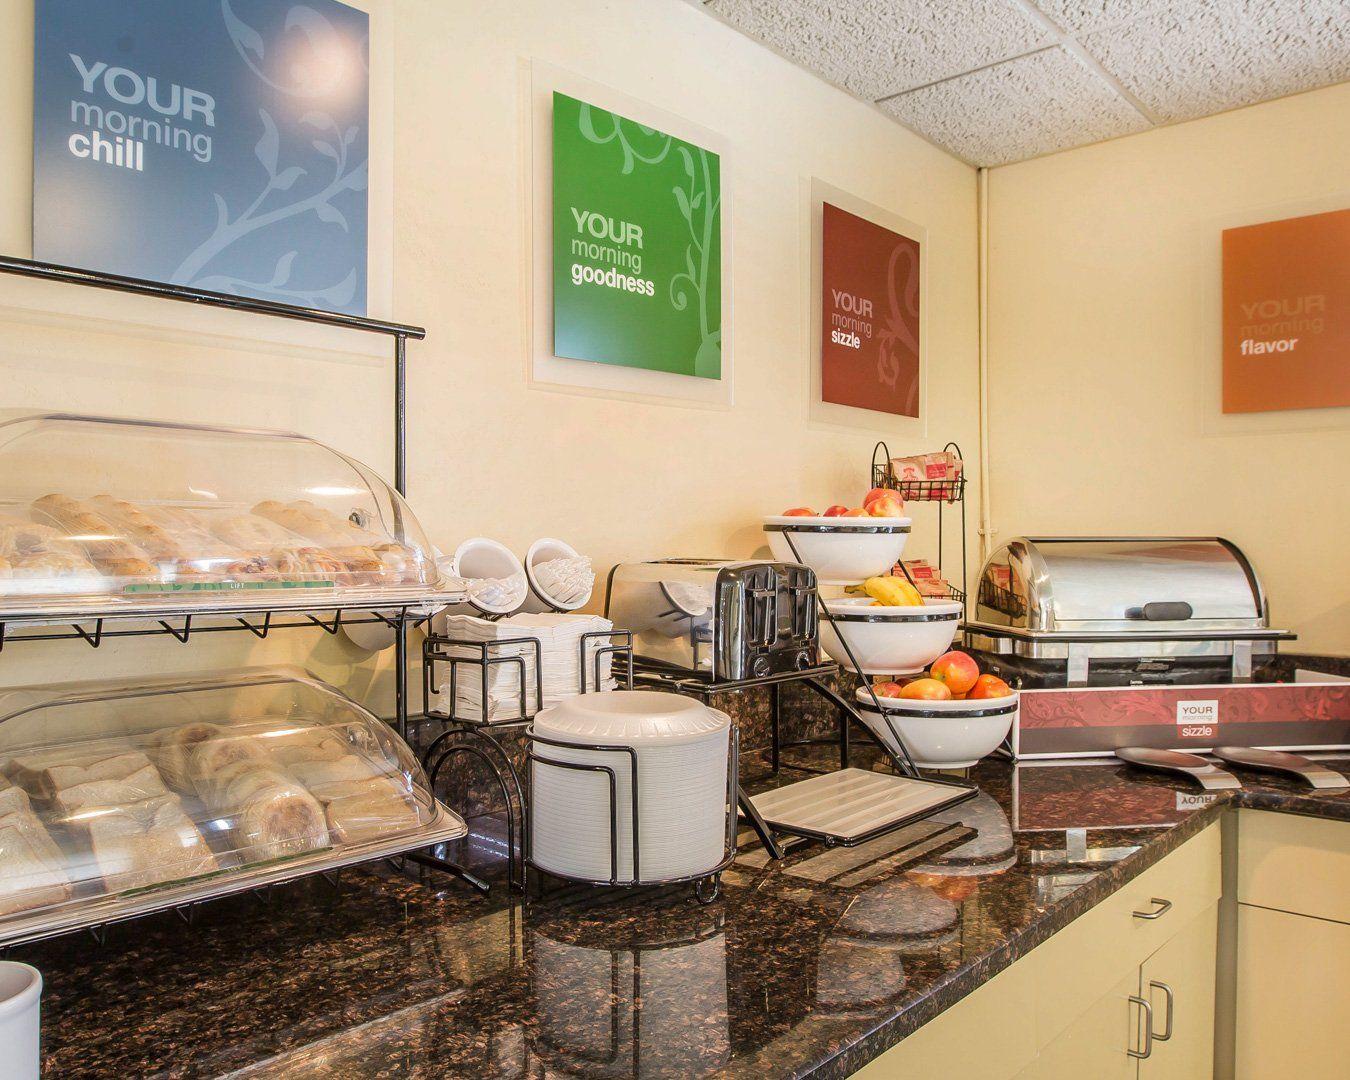 Free Breakfast Buffet Comfort Inn Hotel In North Myrtle Beach